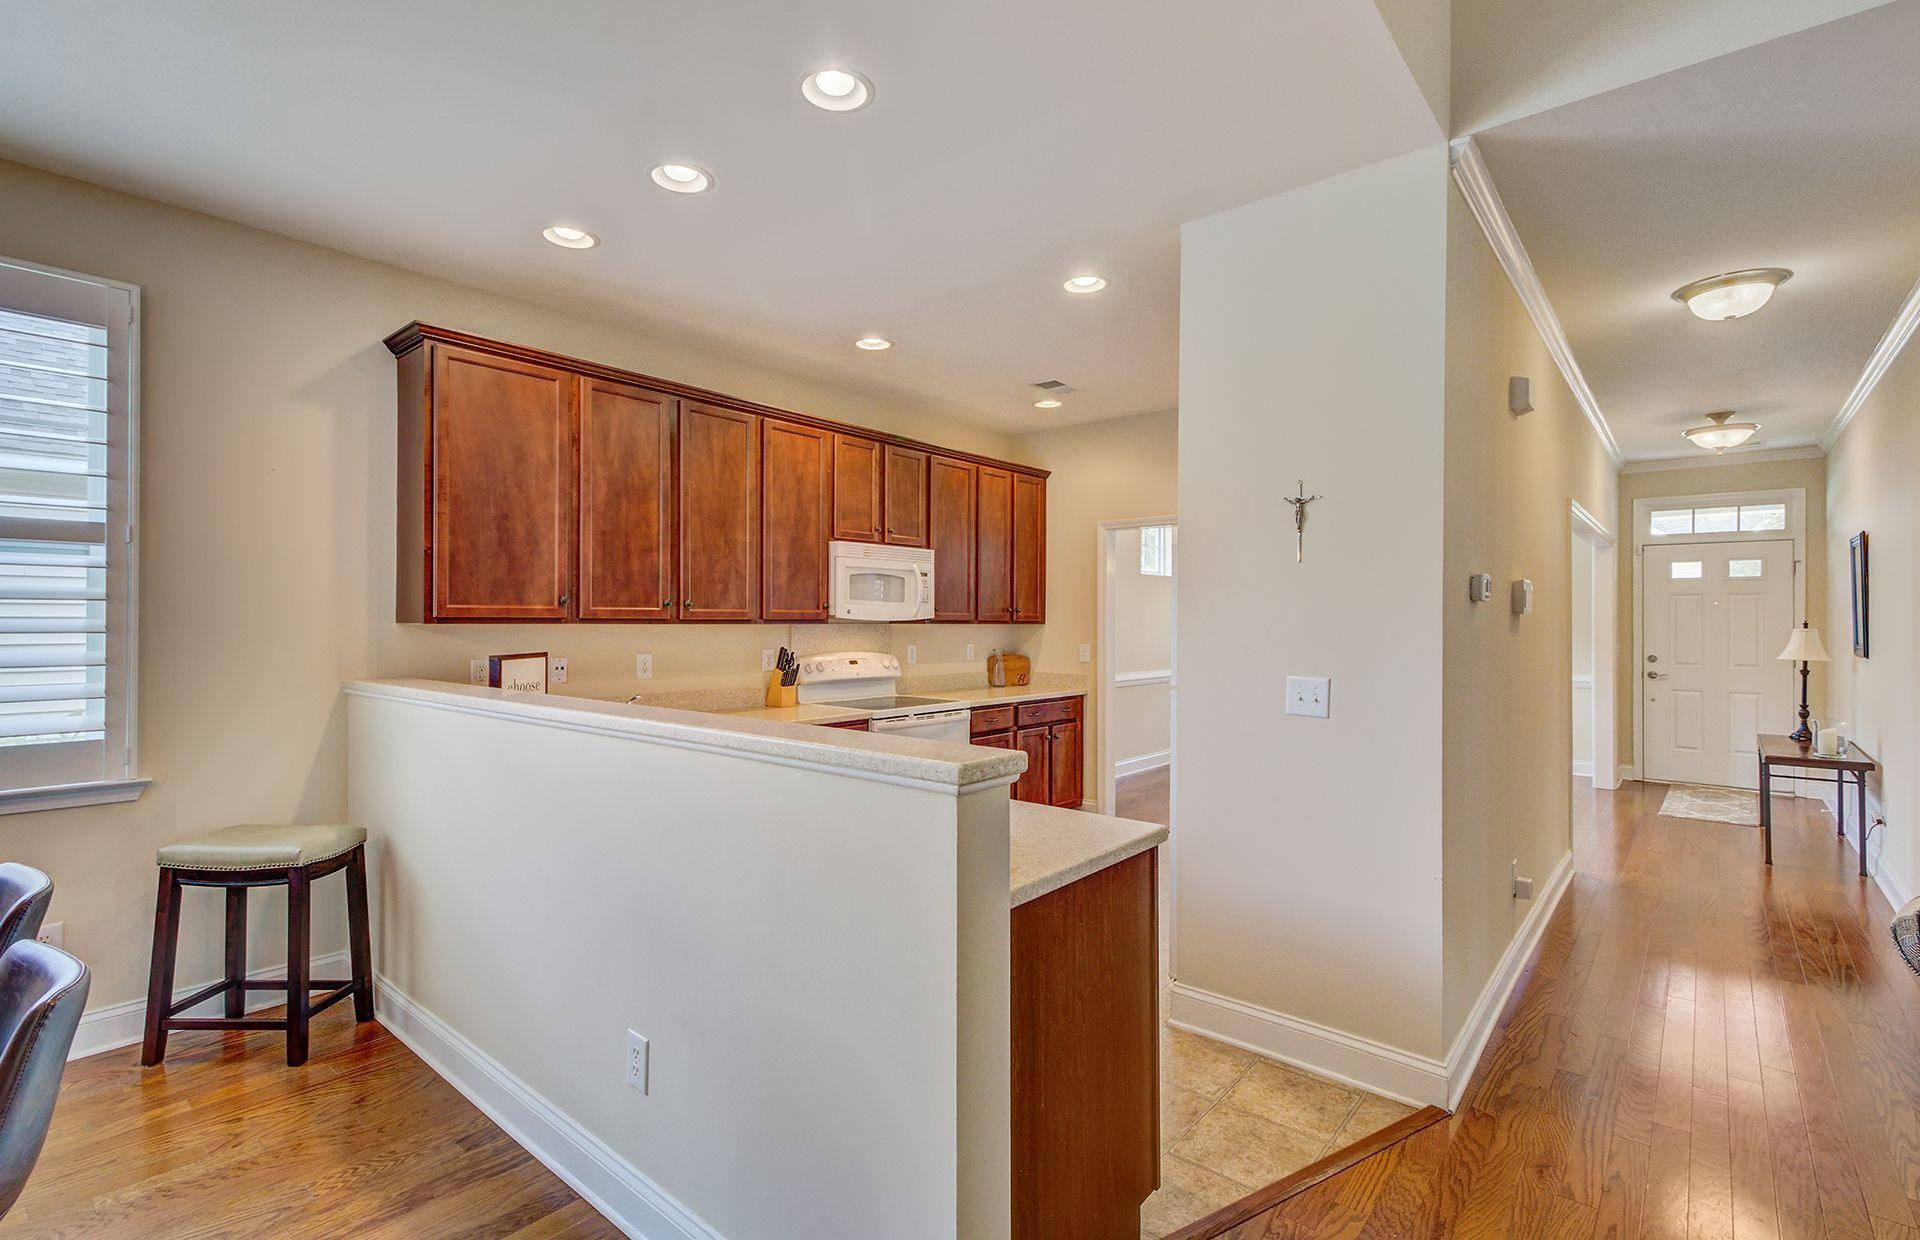 Linnen Place Homes For Sale - 1275 Shingleback, Mount Pleasant, SC - 0